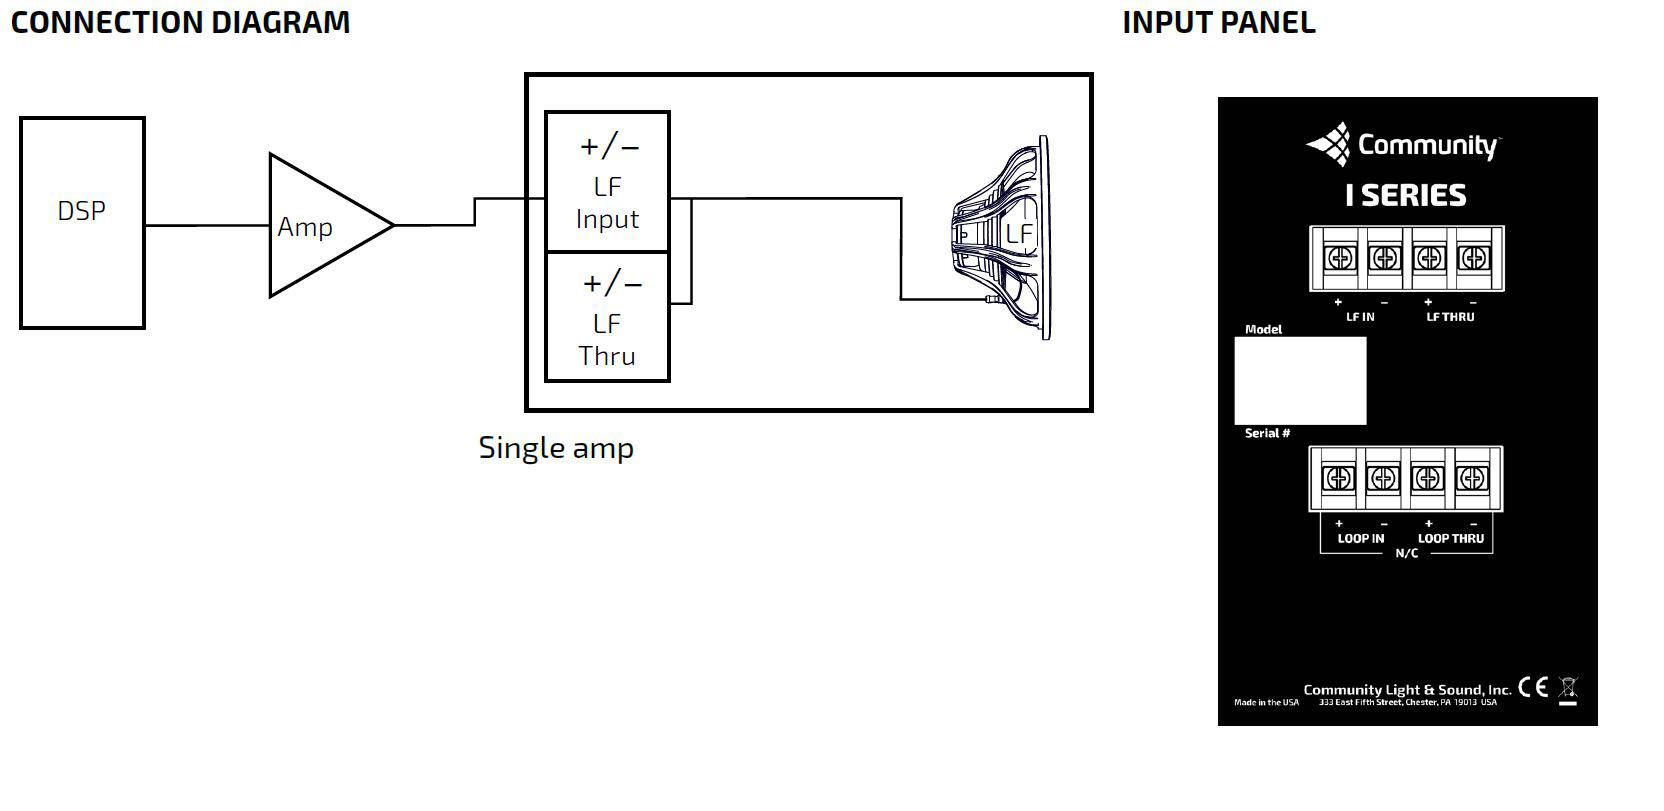 X44 Wiring Diagram Simple Renault Visu Community Is6 112w Medium Power 12 Inch Subwoofer White Led Circuit Diagrams